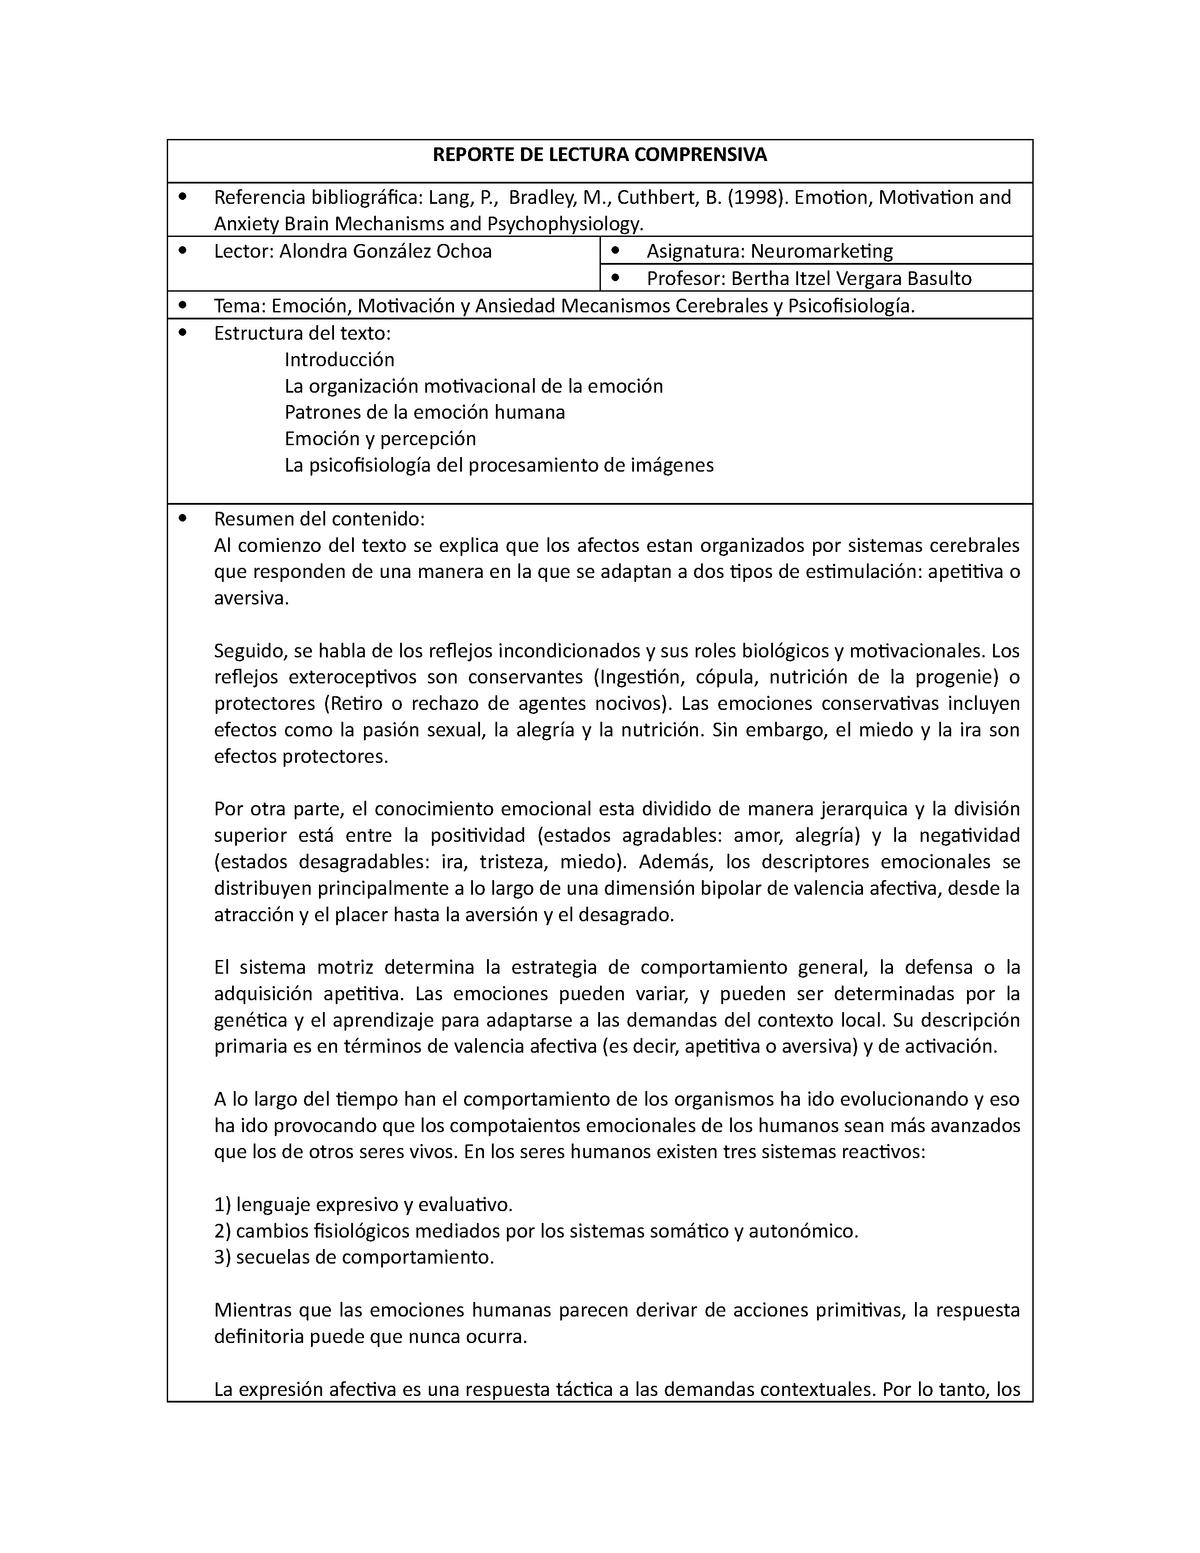 Reporte De Lectura Comprensiva 3 Neuromercadología Studocu